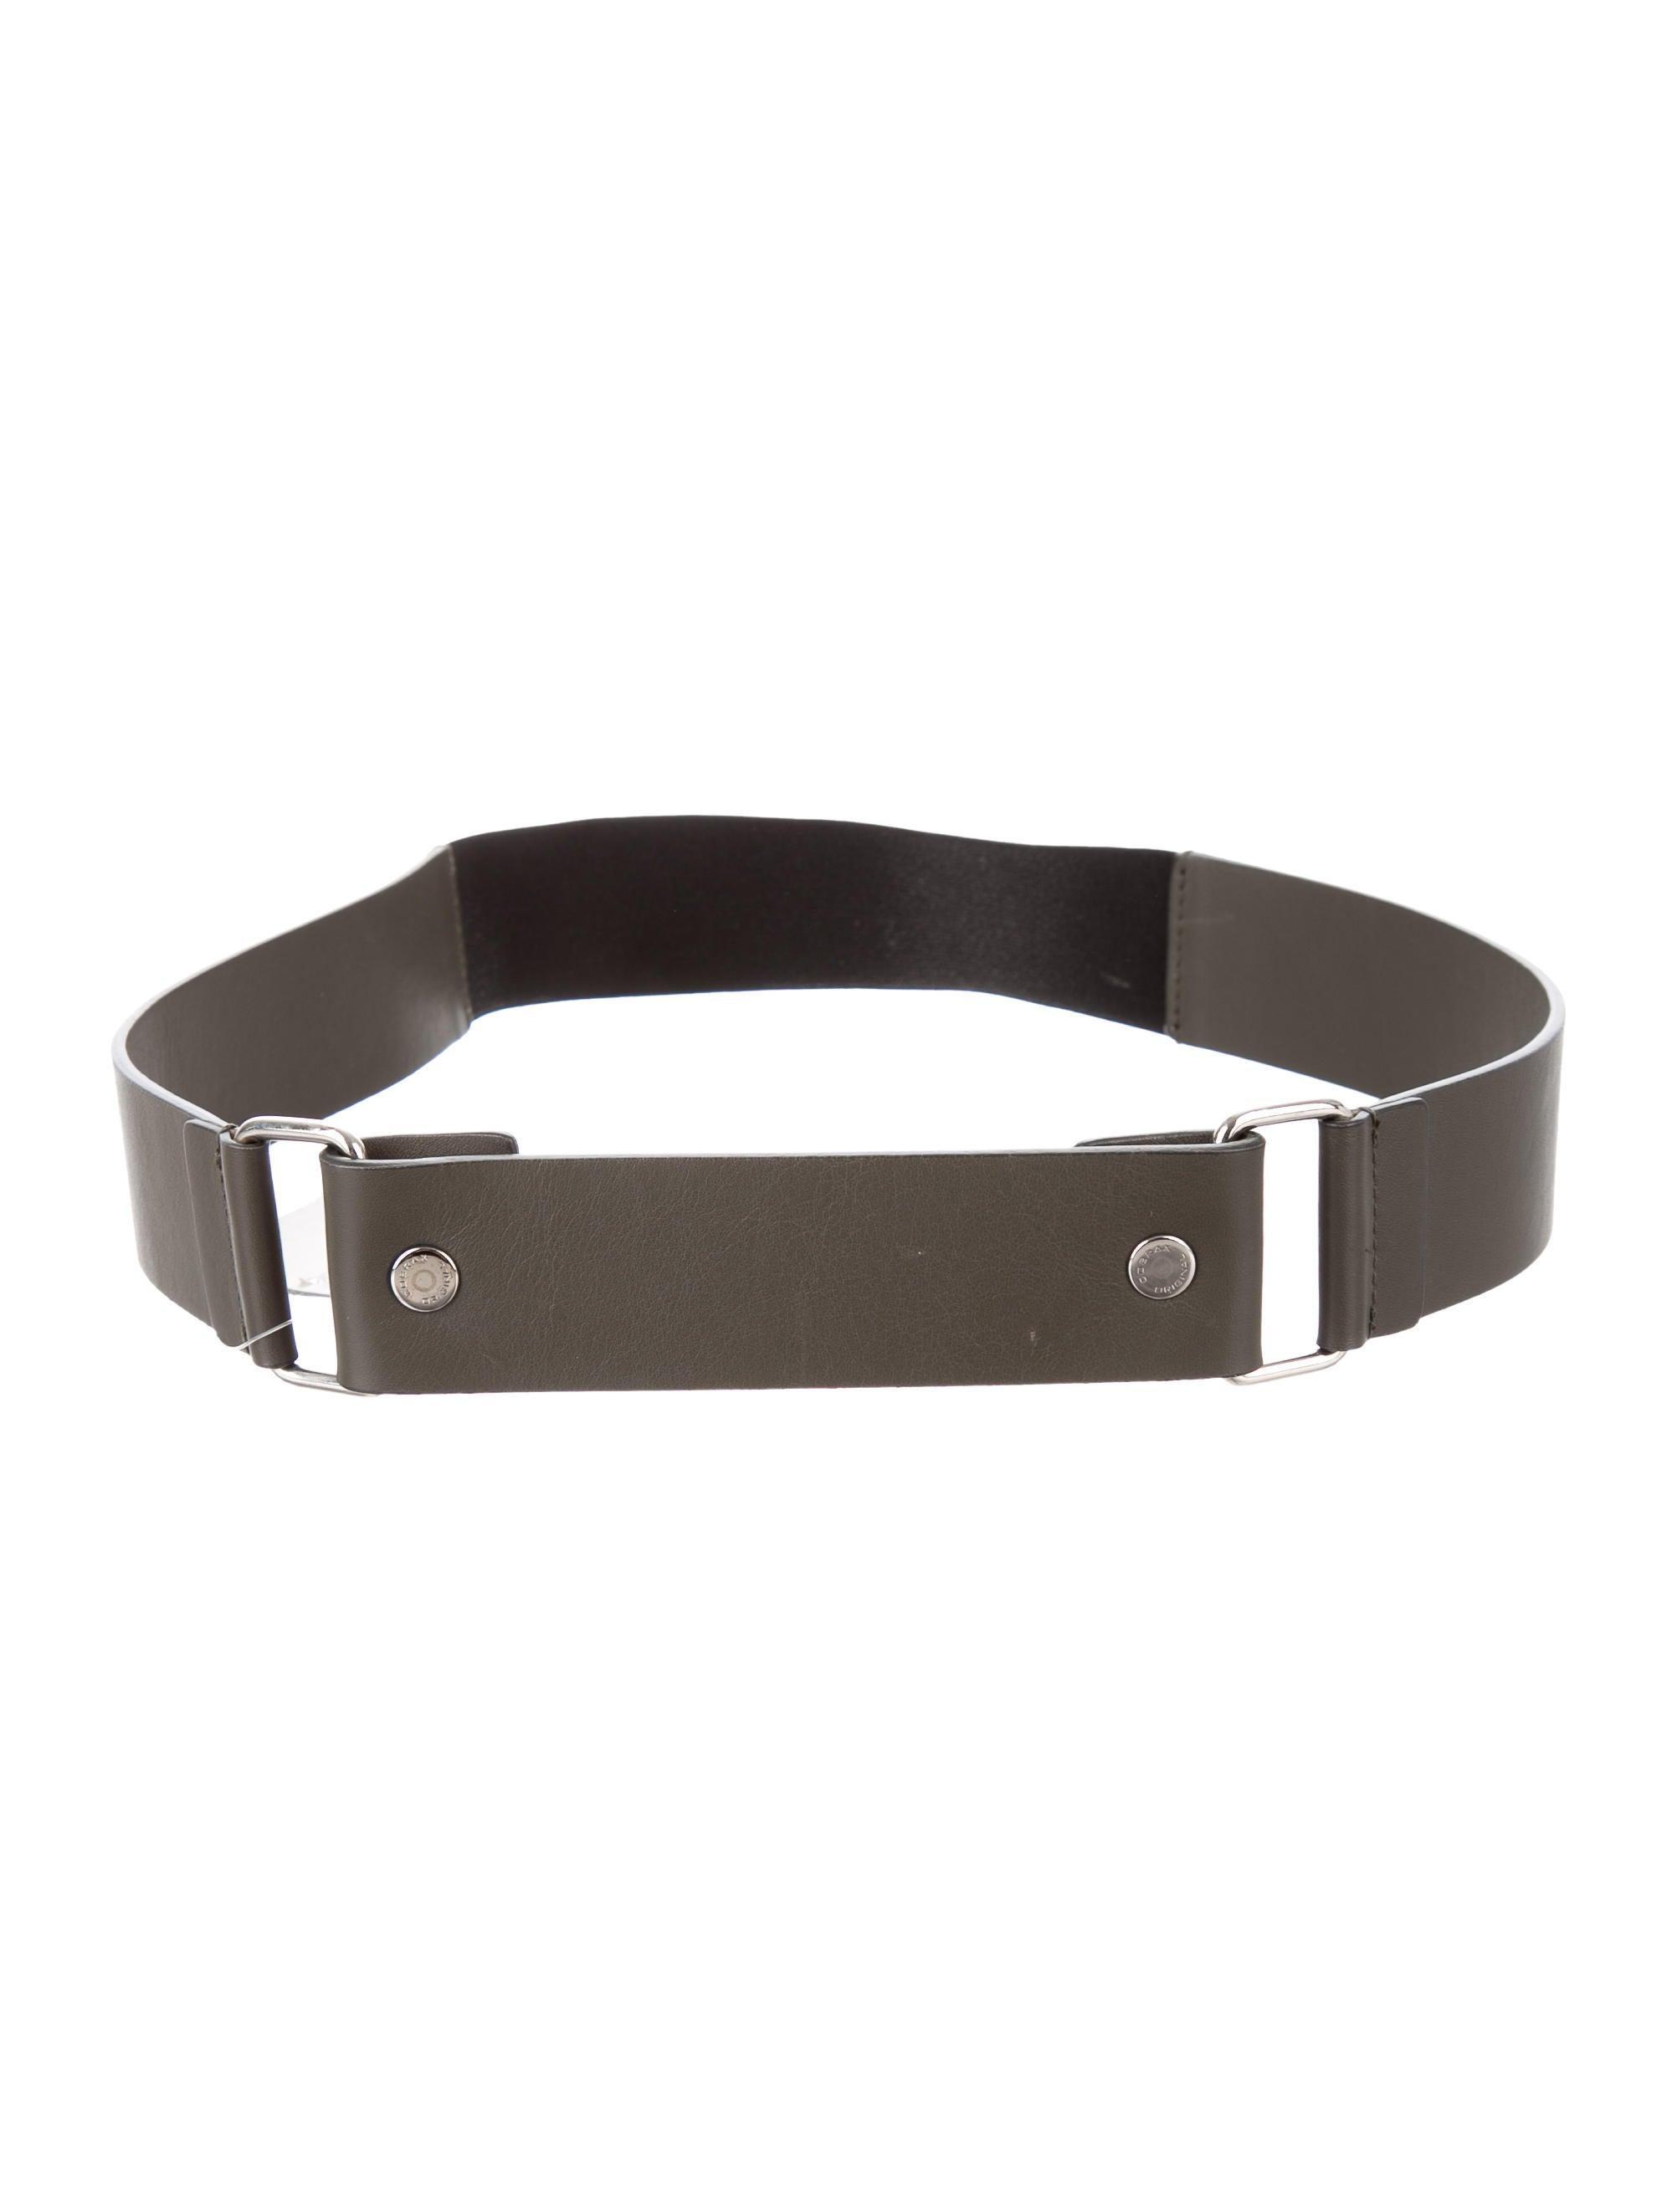 jil sander navy grey leather belt w tags accessories